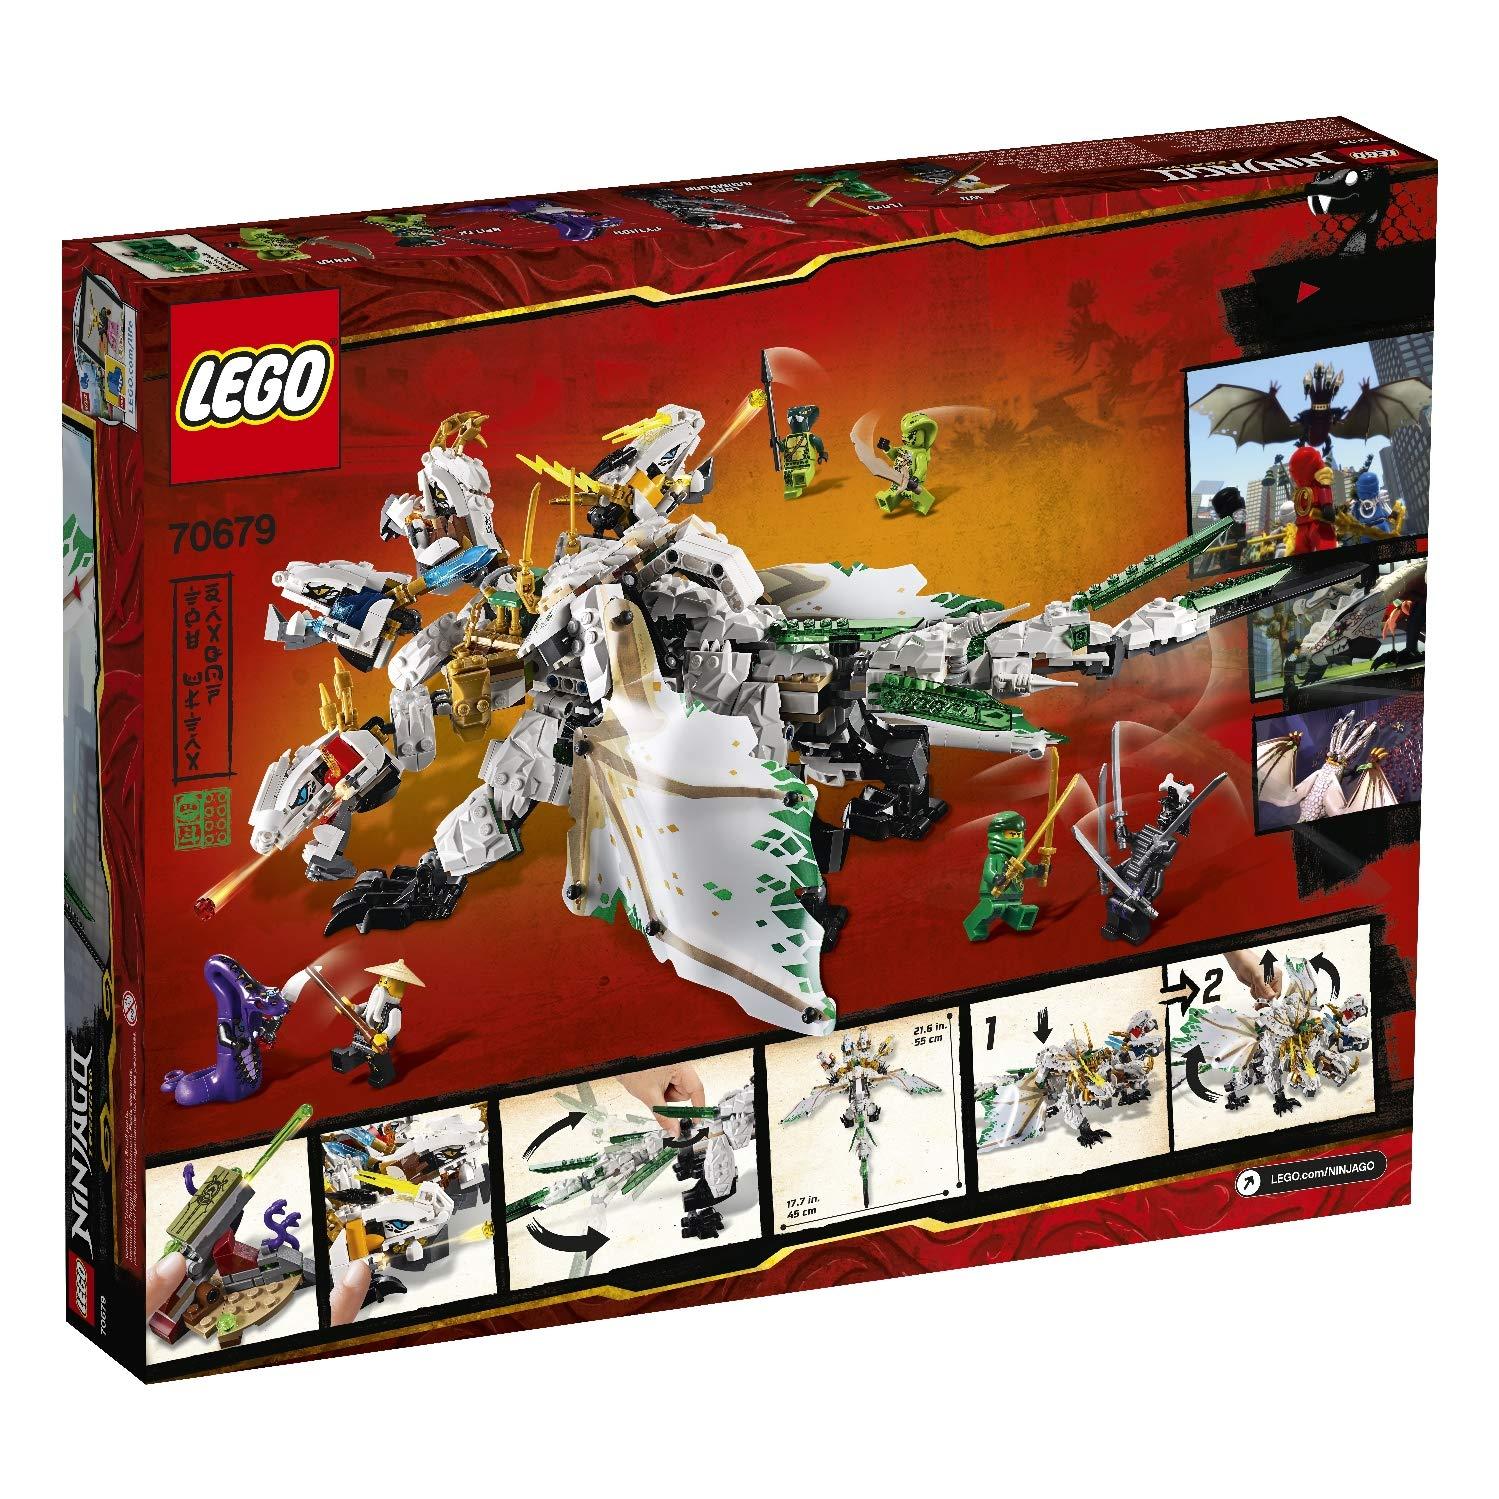 Lego 70666 Children S Toy Colourful Brick Stella Story